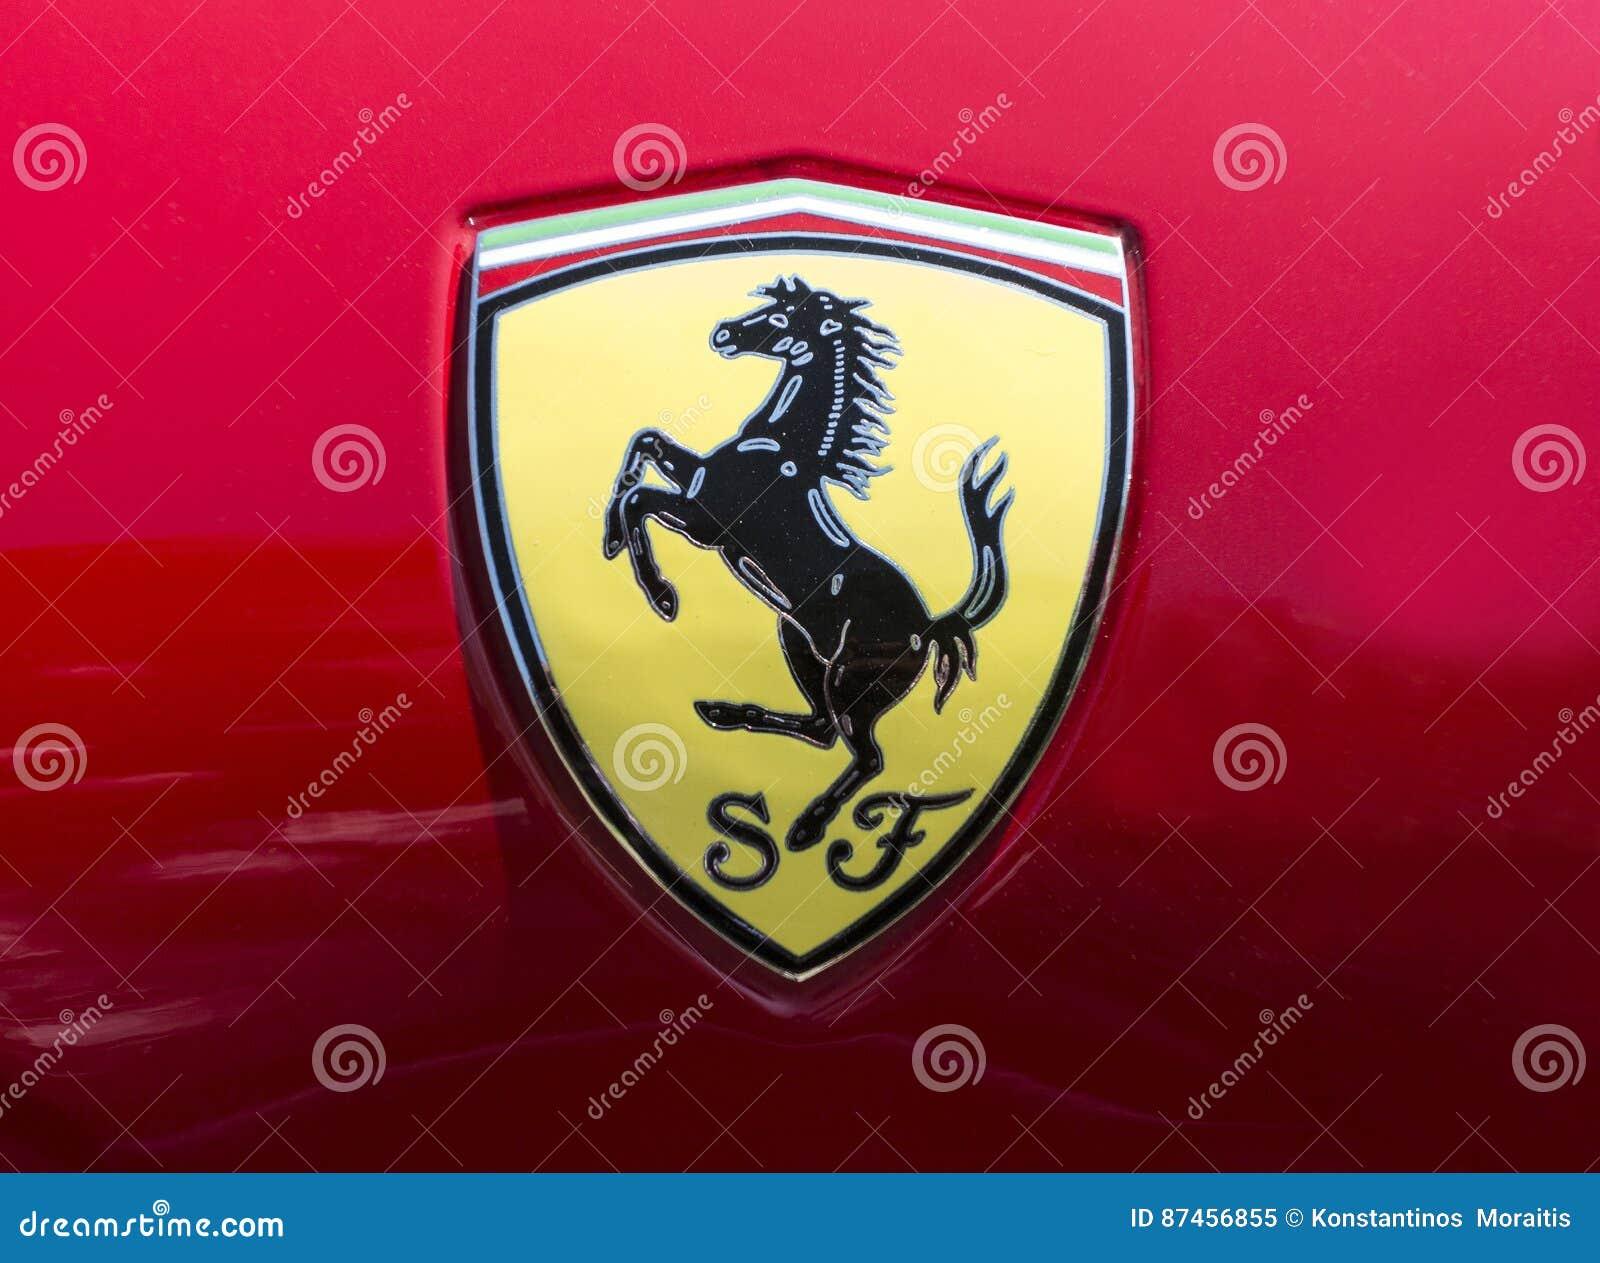 Ferrari Car Logo Editorial Image Image Of Backgound 87456855